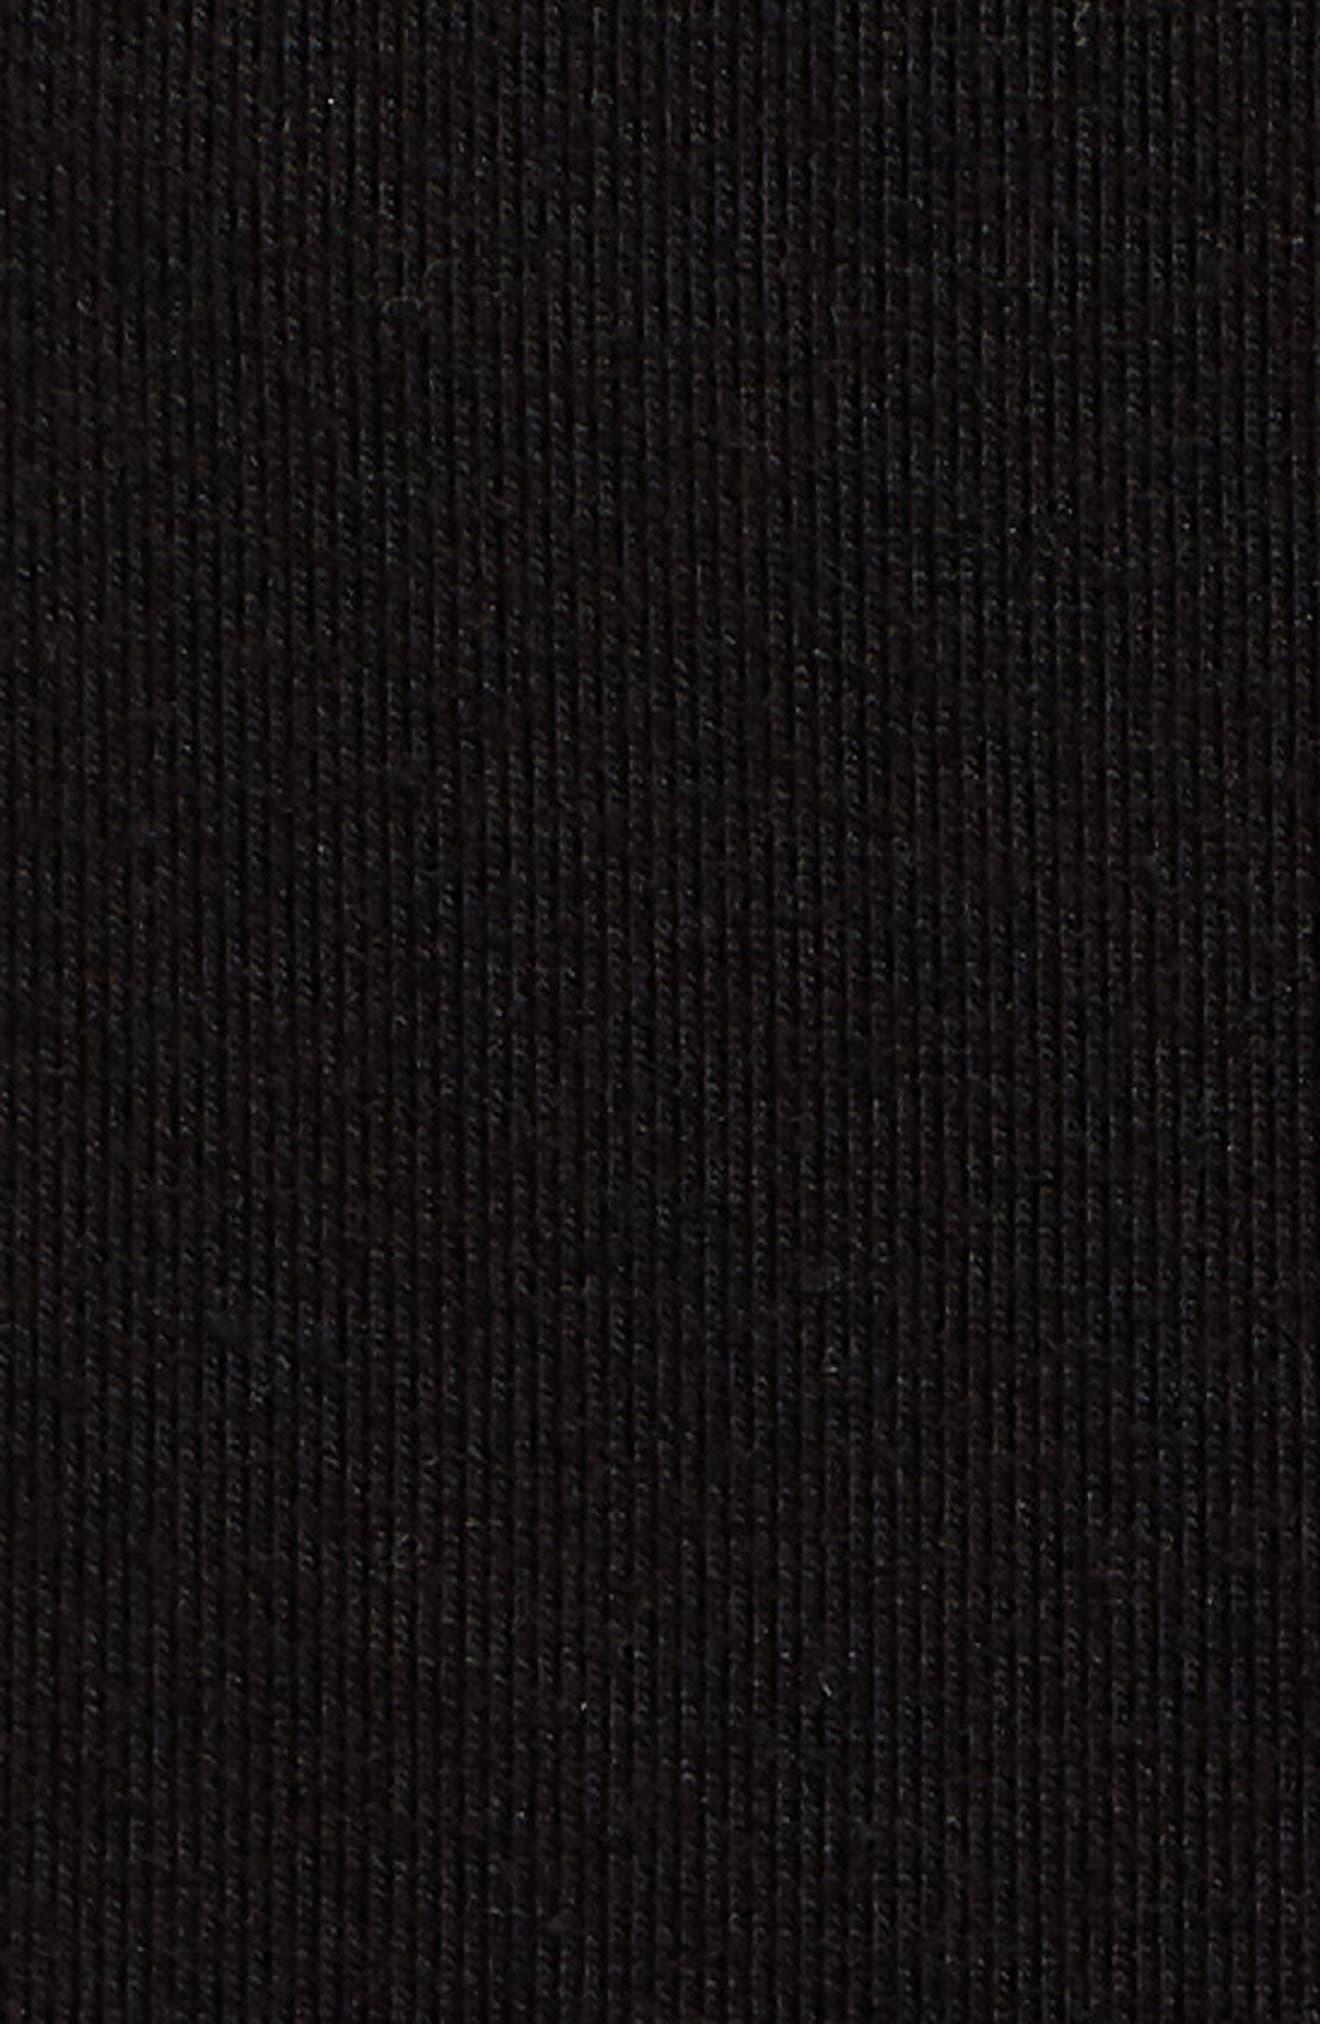 High Waist Crop Leggings,                             Alternate thumbnail 6, color,                             BLACK